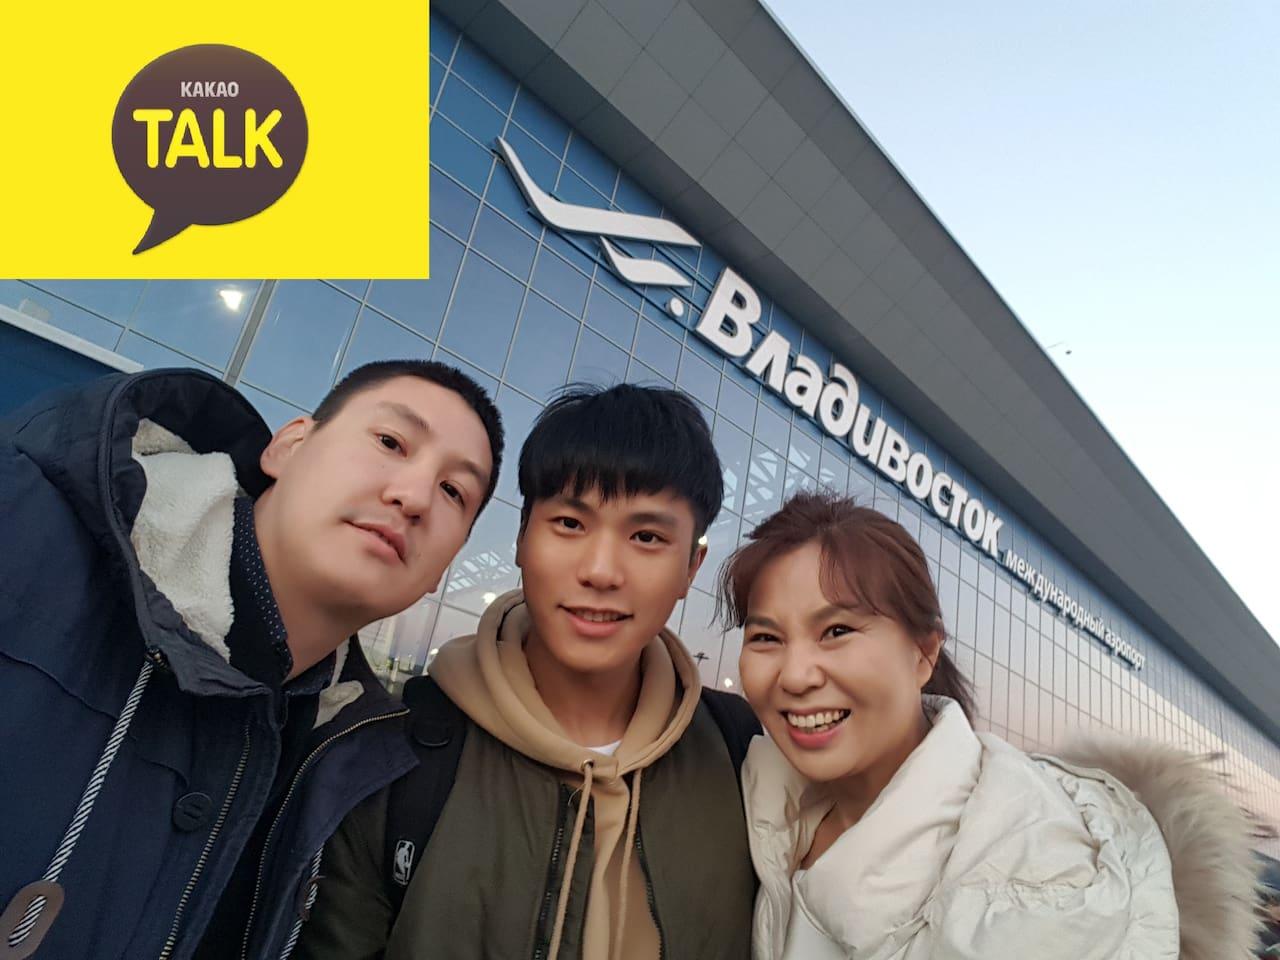 С нашими гостями в аэропорту Владивостока (In airport of Vladivostok with our Guests).